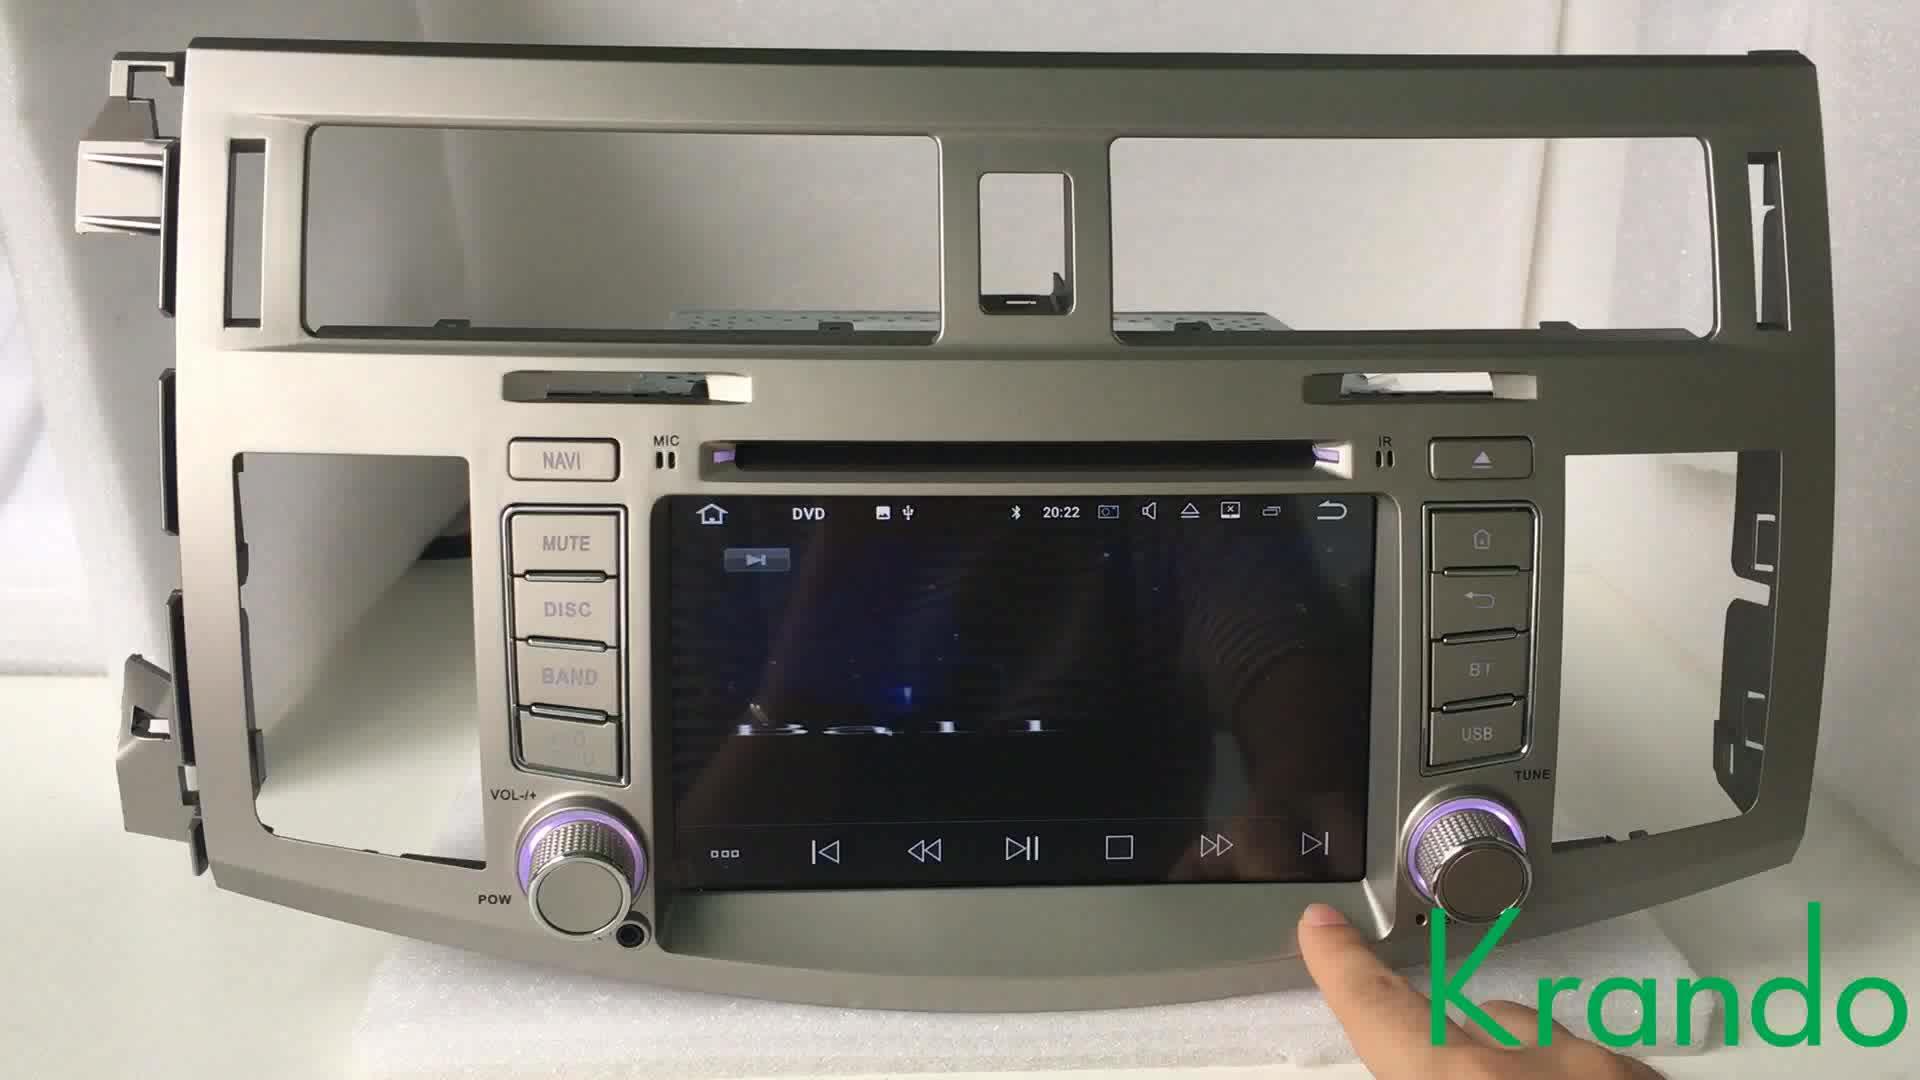 "Krando Android 7.1 7 ""araba pc navigasyon gps ile toyota avalon 2008-2010 için araba DVD OYNATICI TV radyo bluetooth ile KD-TA708"